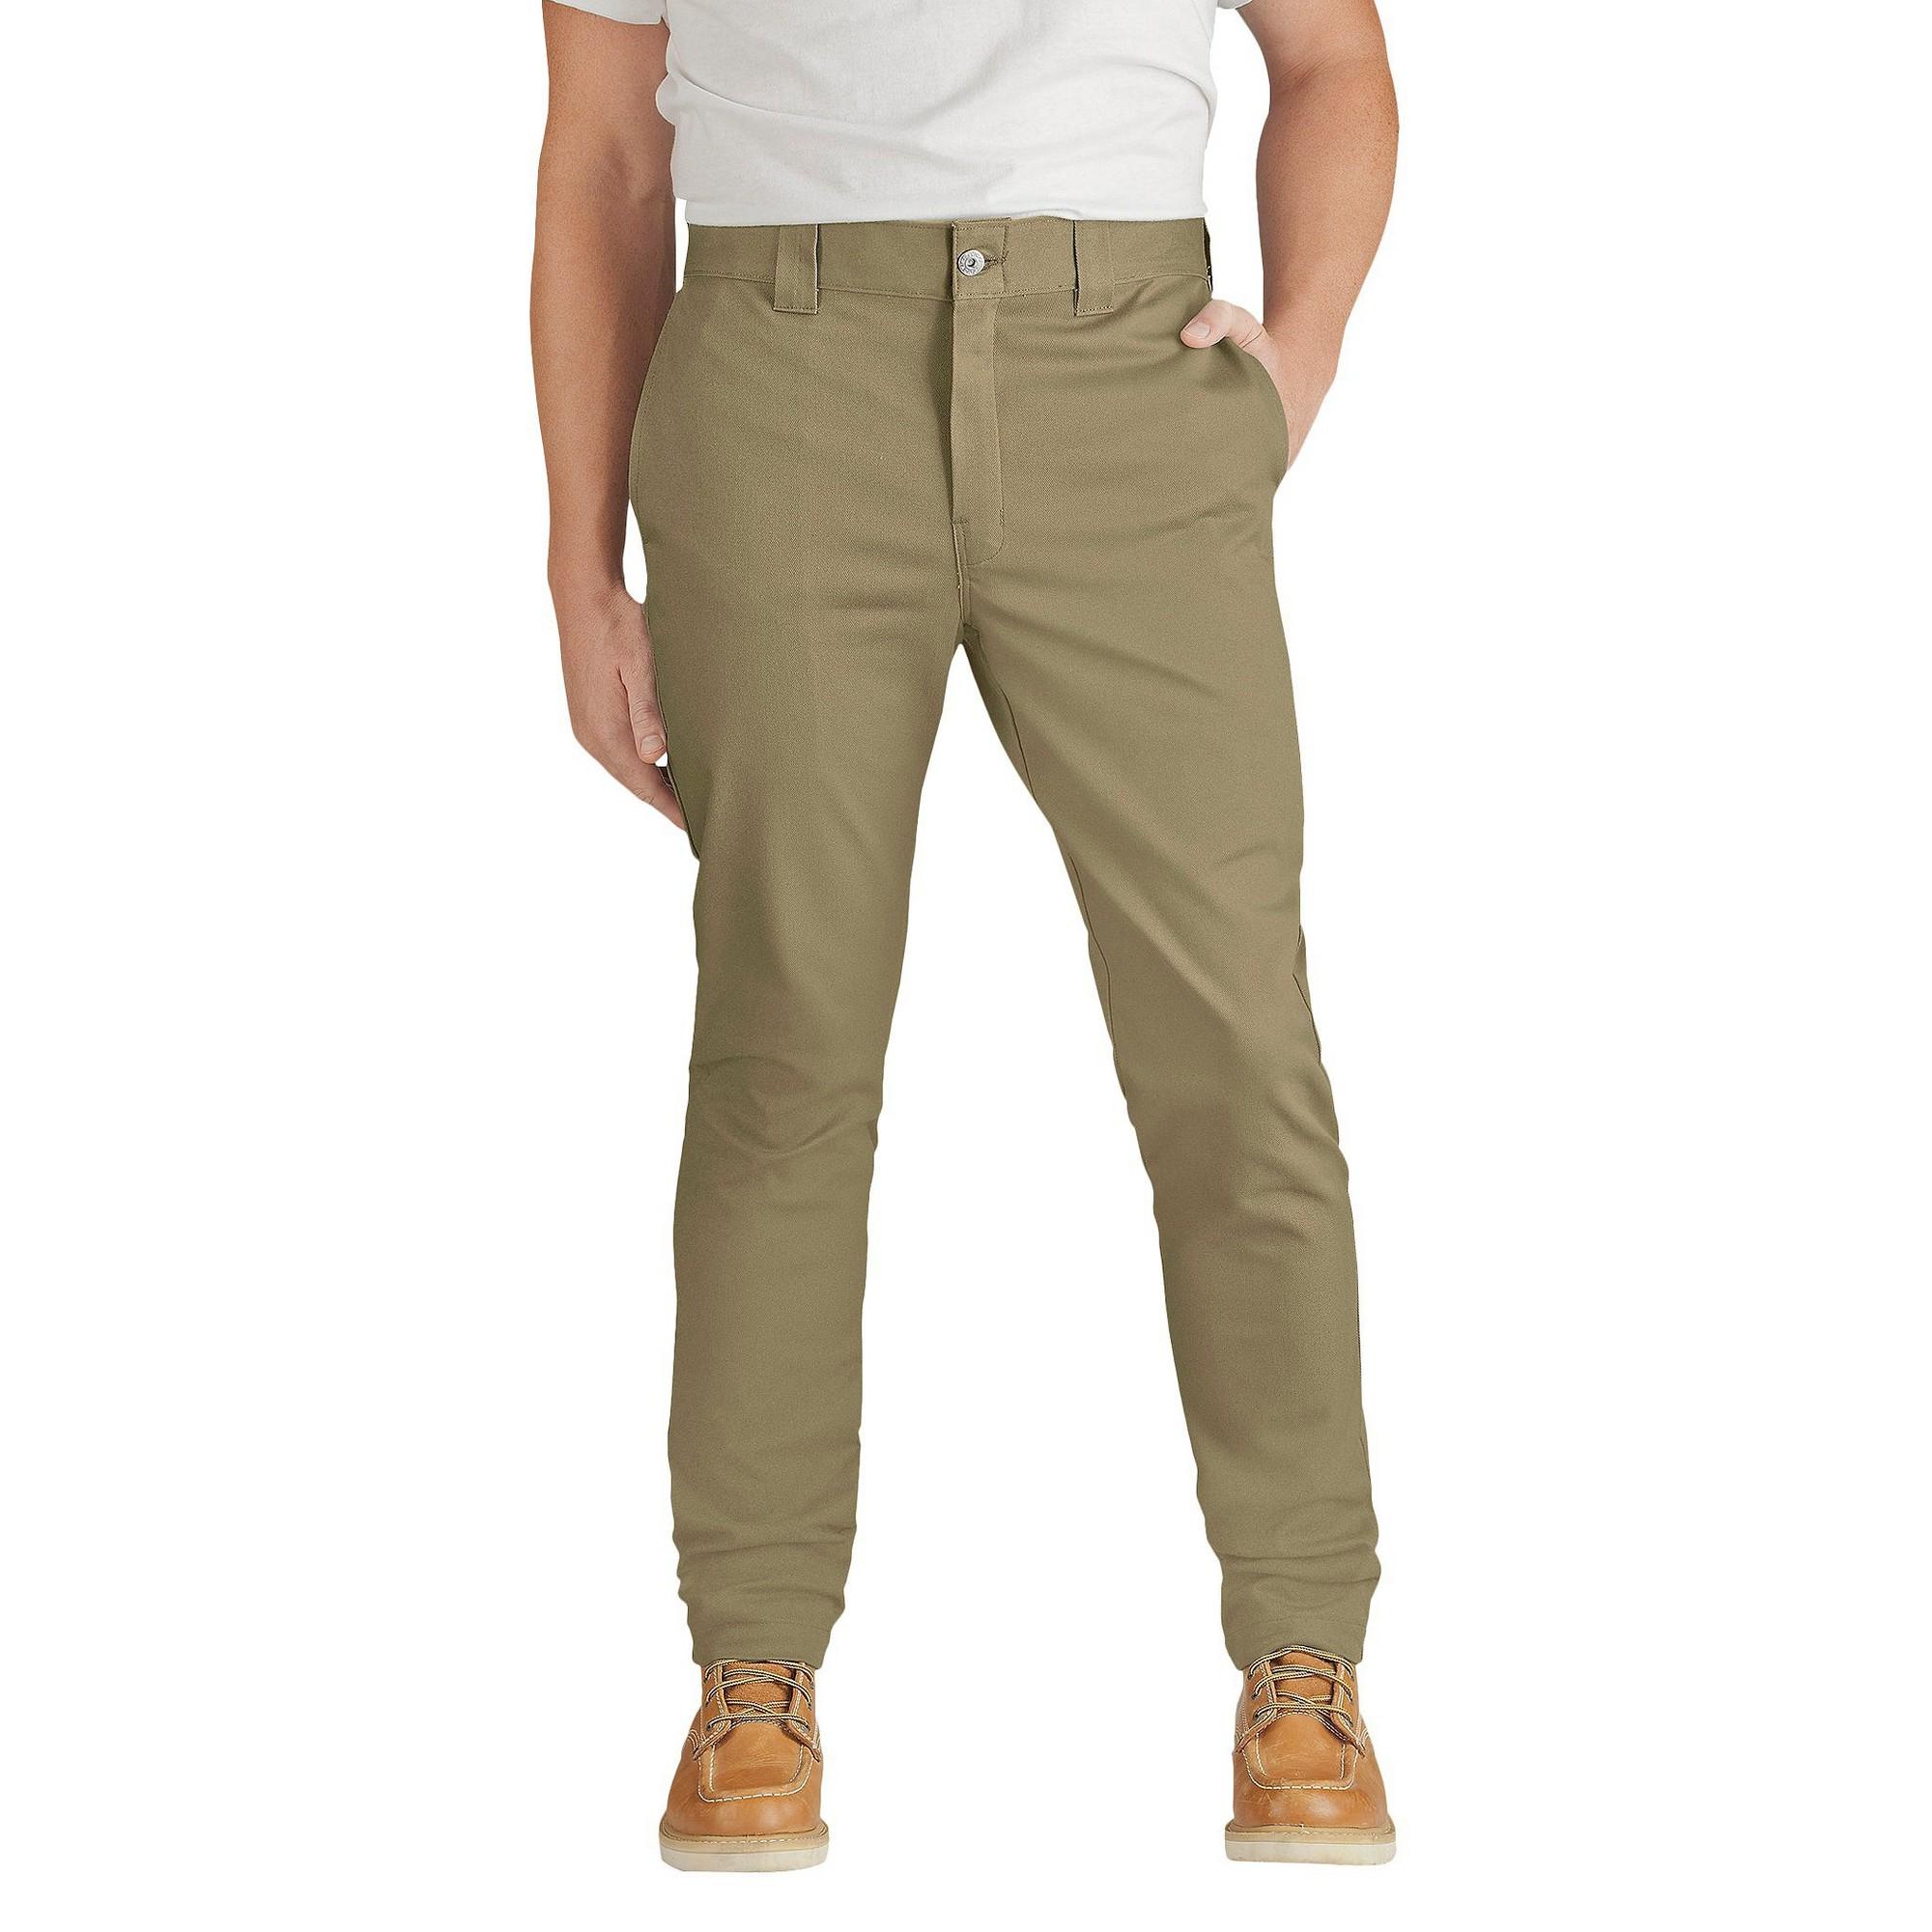 d8bb03c4 Dickies Men's Slim Skinny Fit Flex Twill Pants- British Tan 32x32 in ...